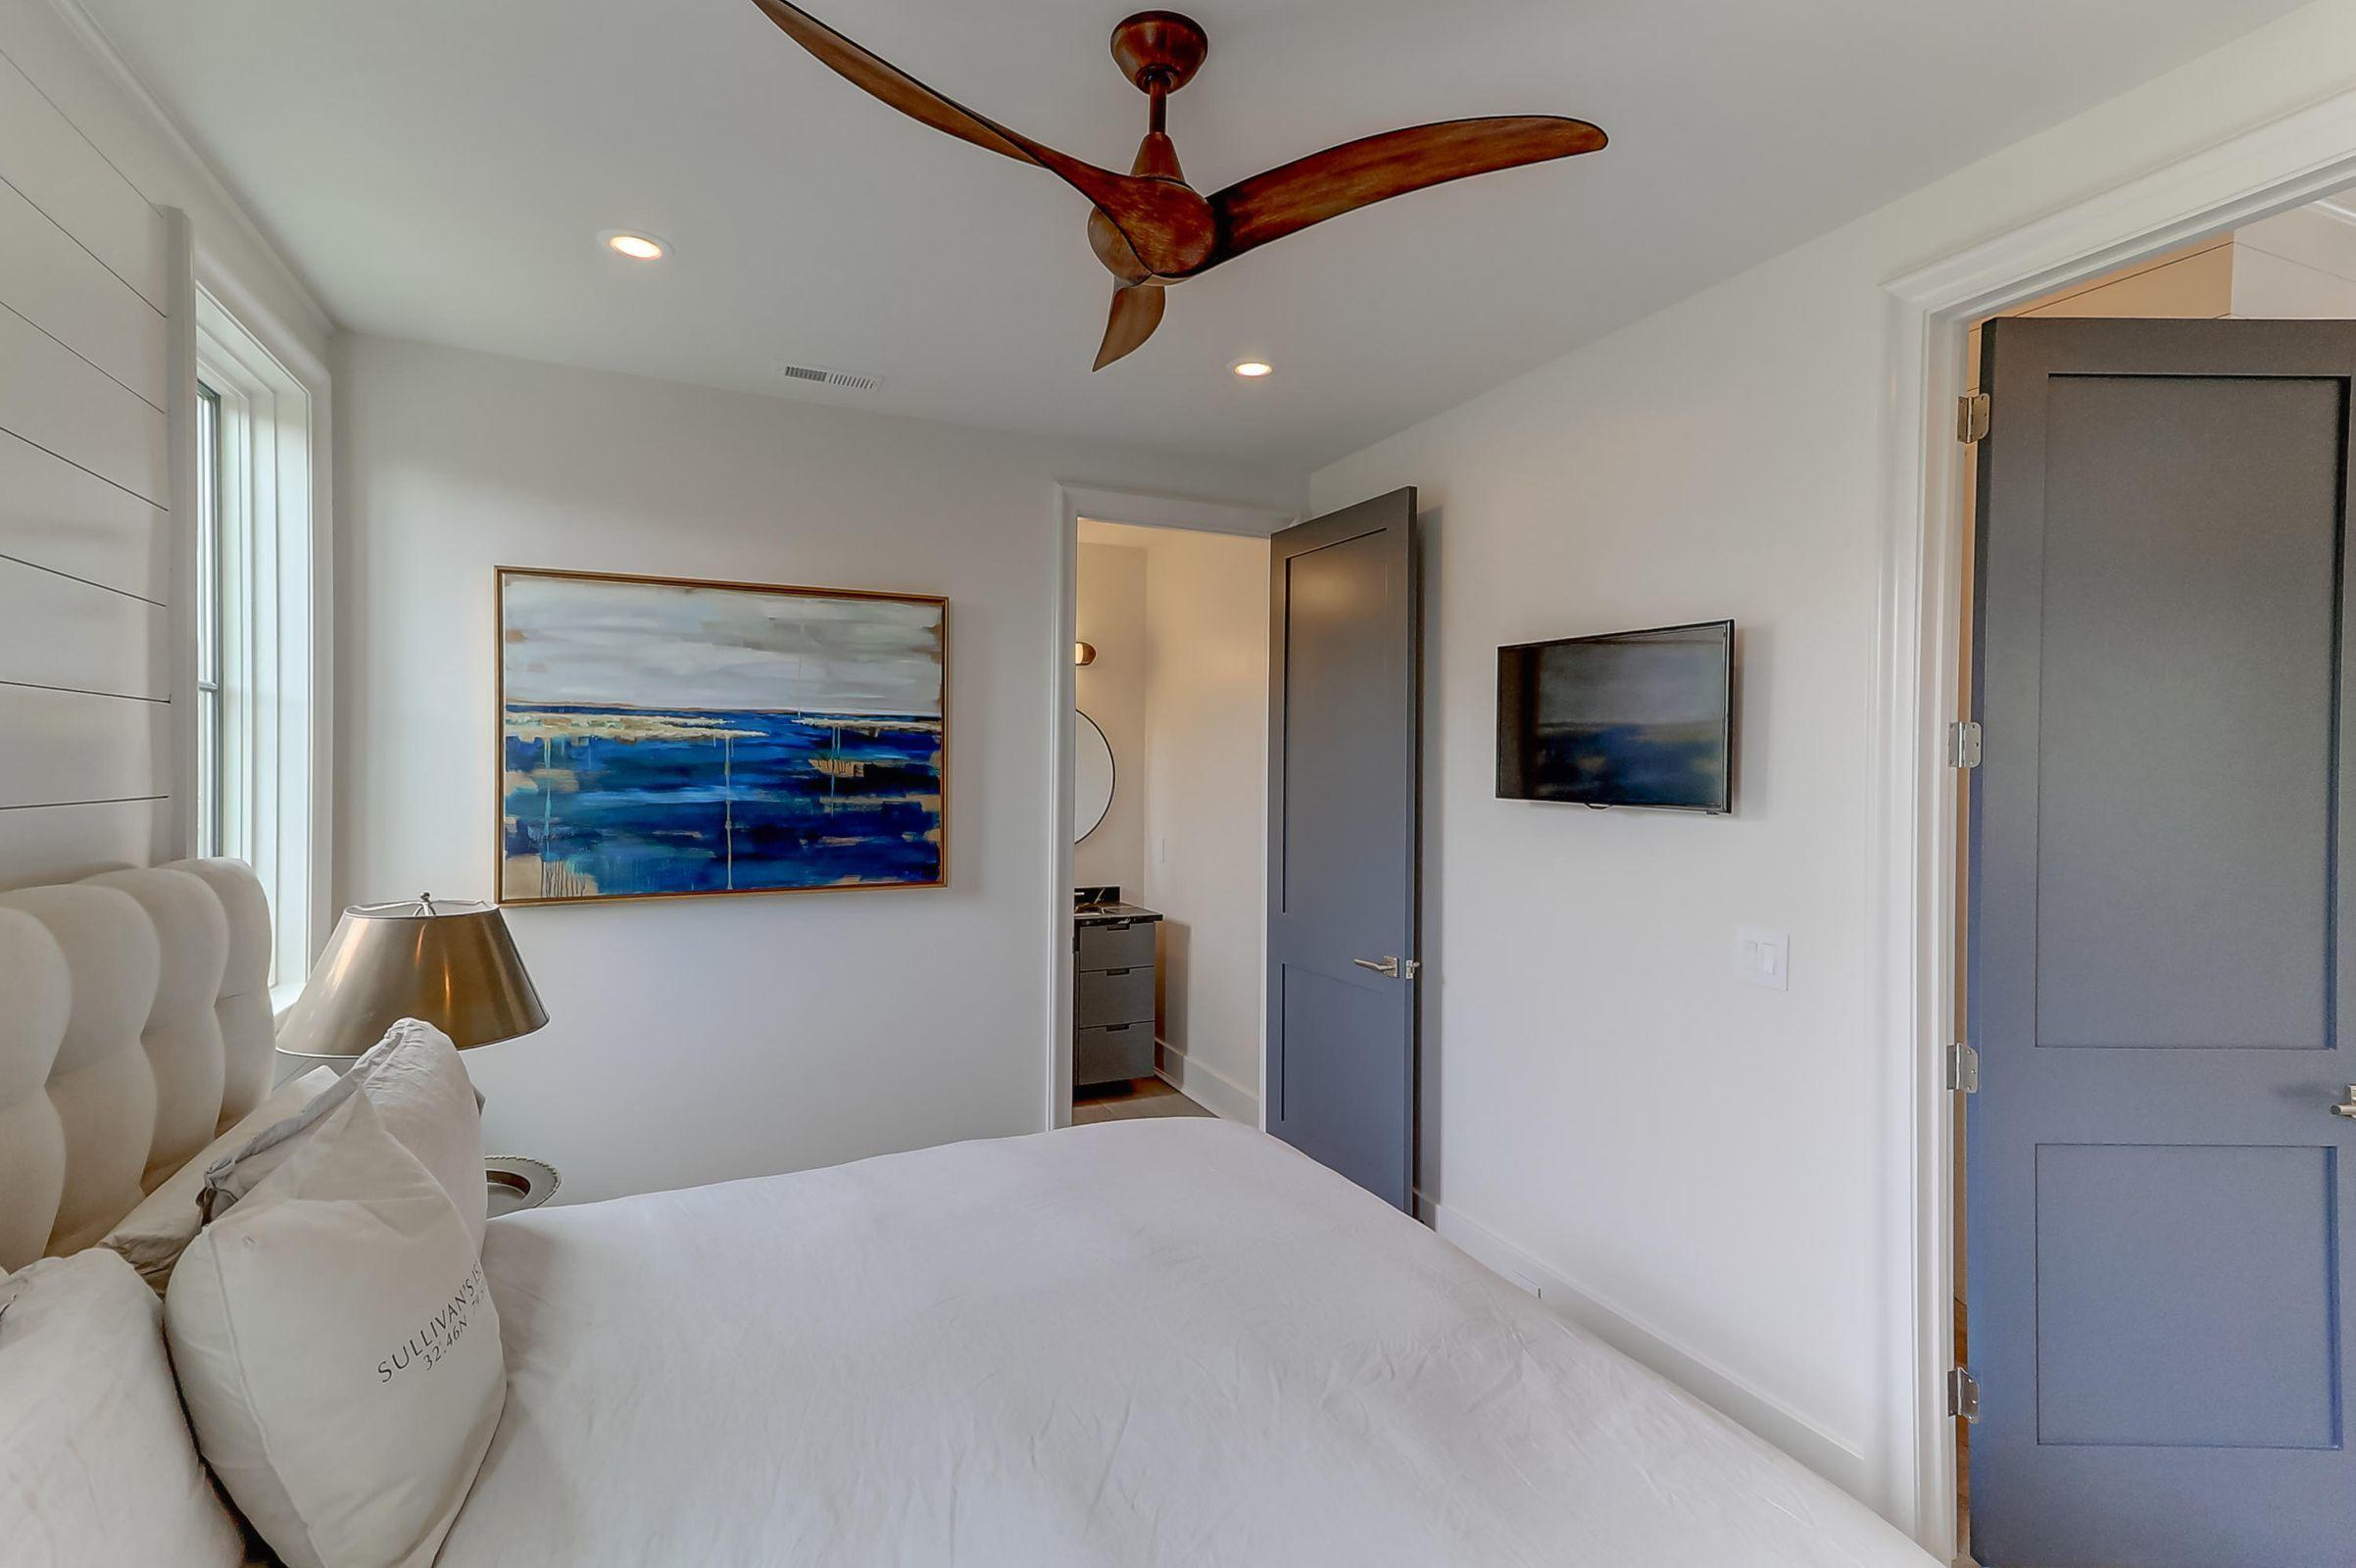 Sullivans Island Homes For Sale - 918 Middle, Sullivans Island, SC - 16